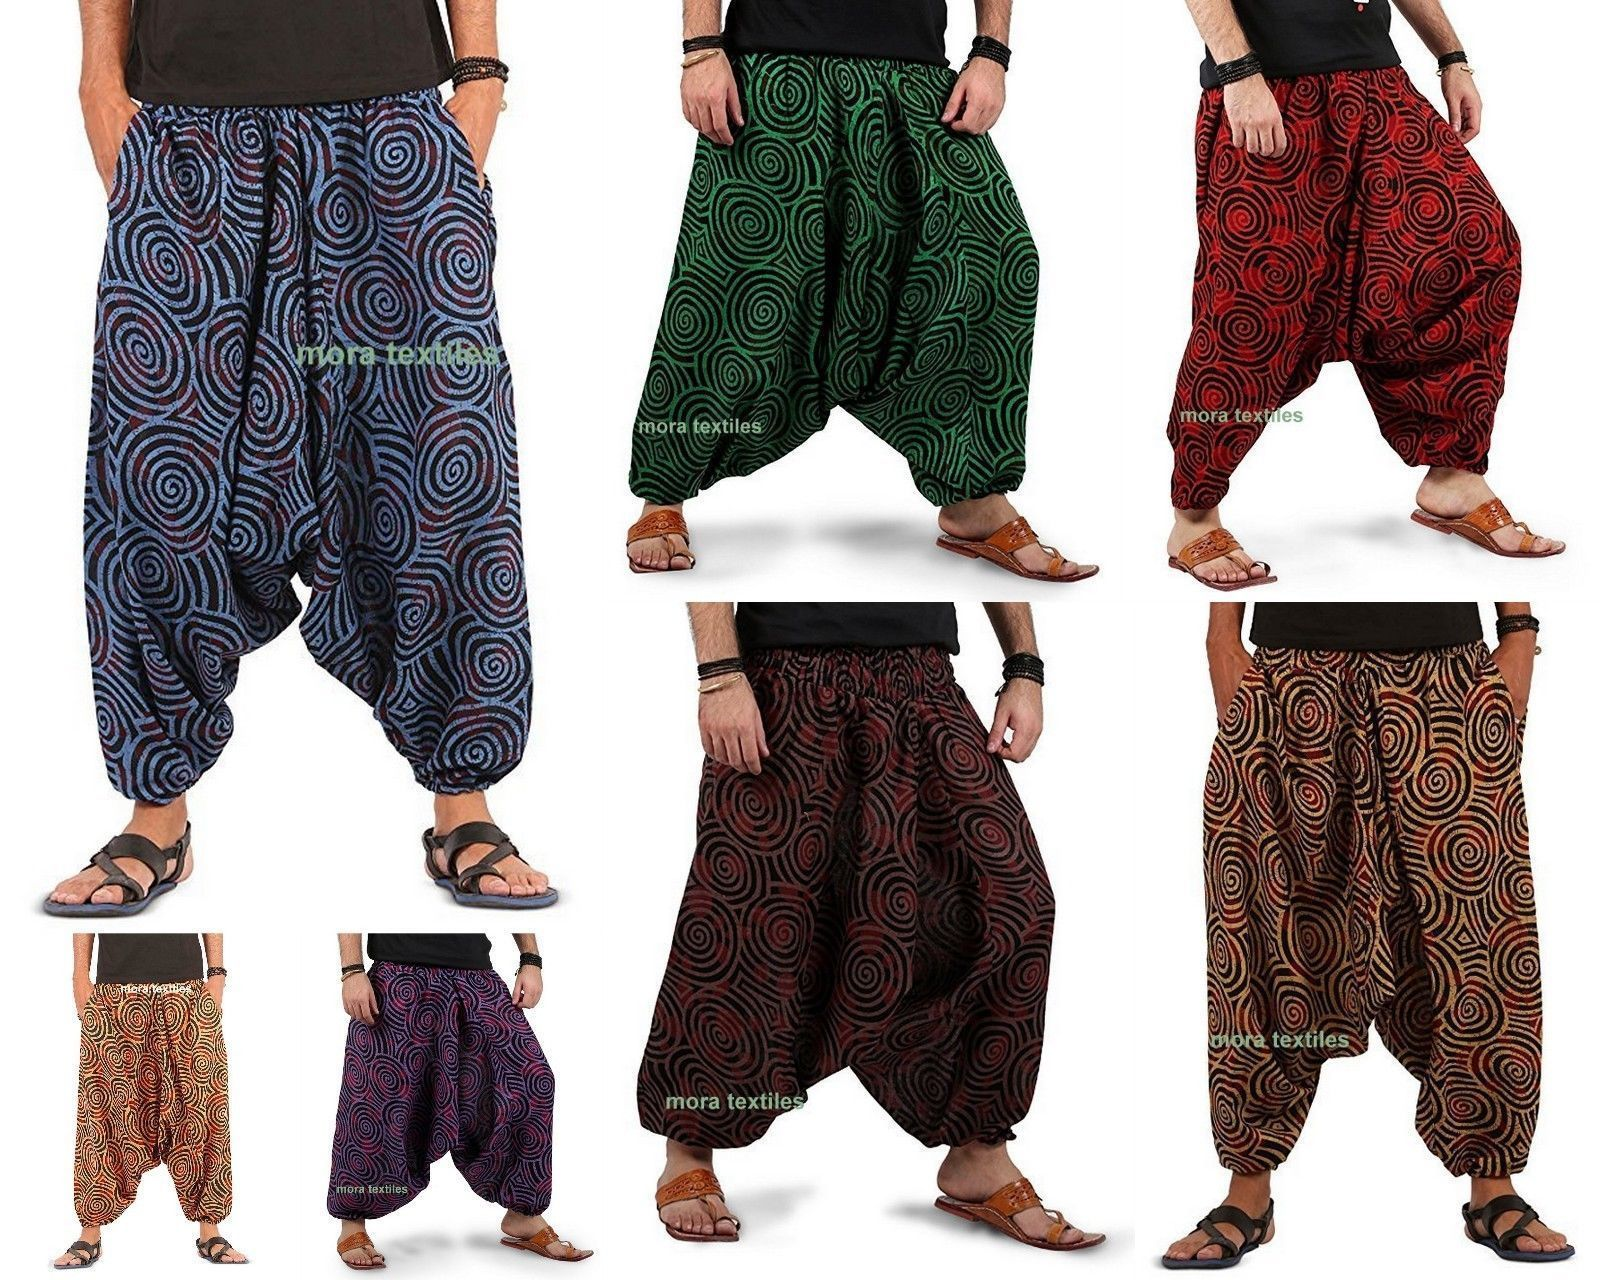 f157f251238ce $11.99 AUD - Indian Baggy Gypsy Harem Pants Yoga Men Women Xmas Gift Swirl  Cotton Trouser